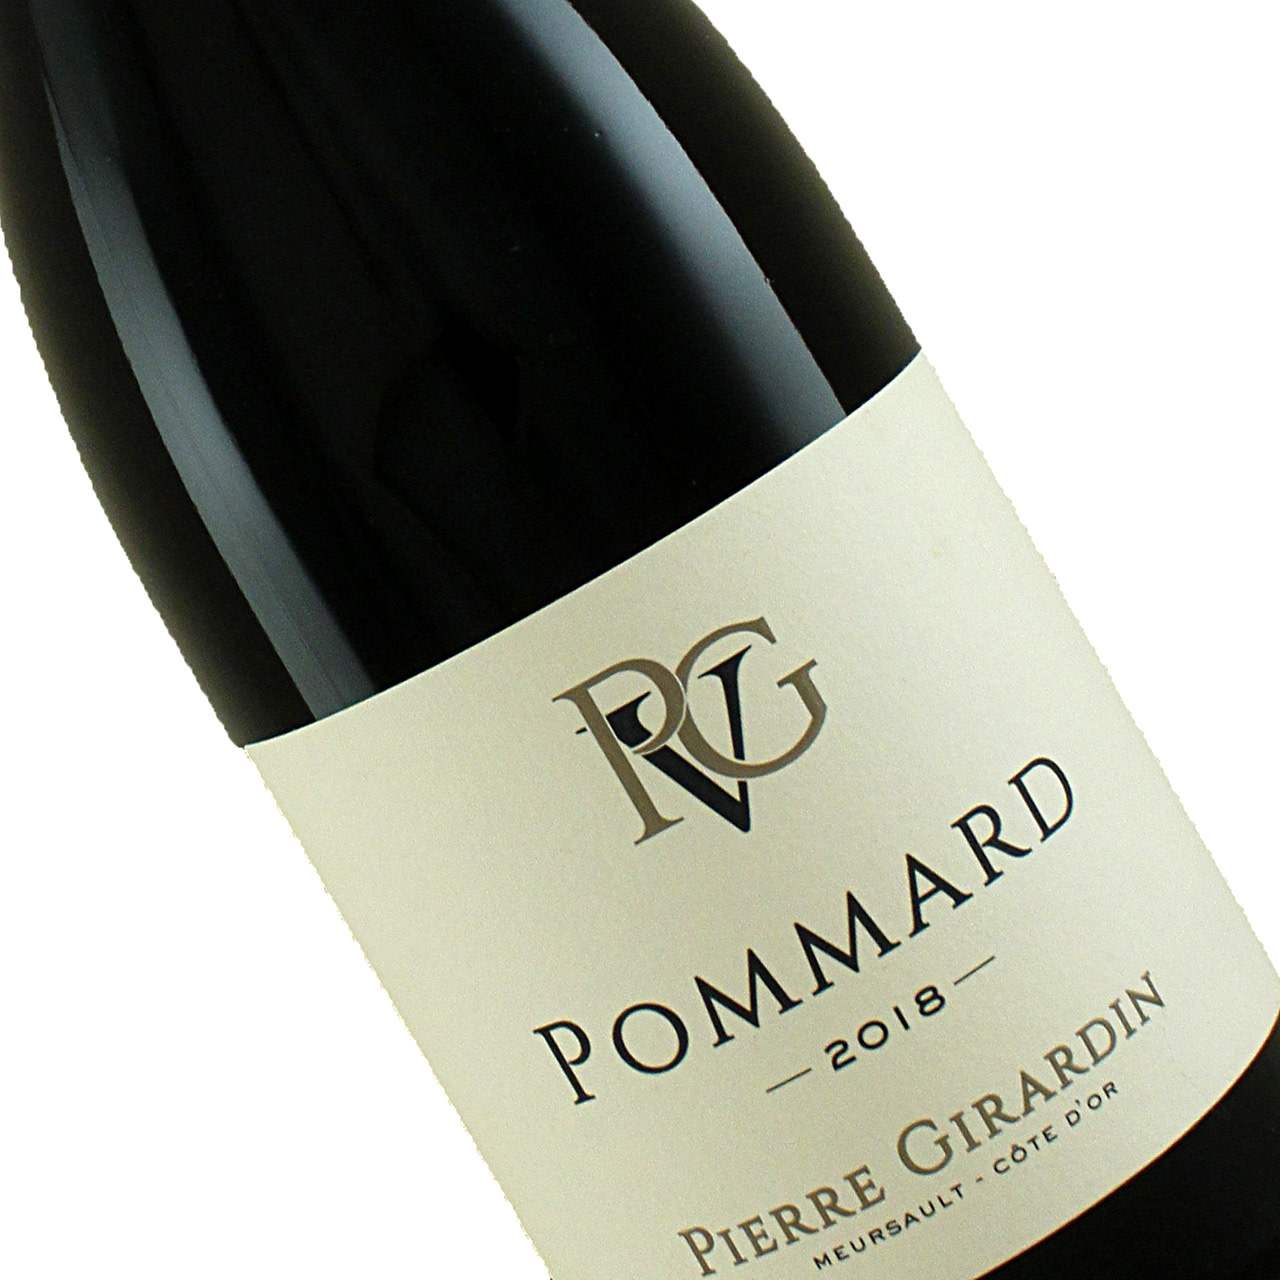 Pierre Girardin 2018 Pommard, Burgundy